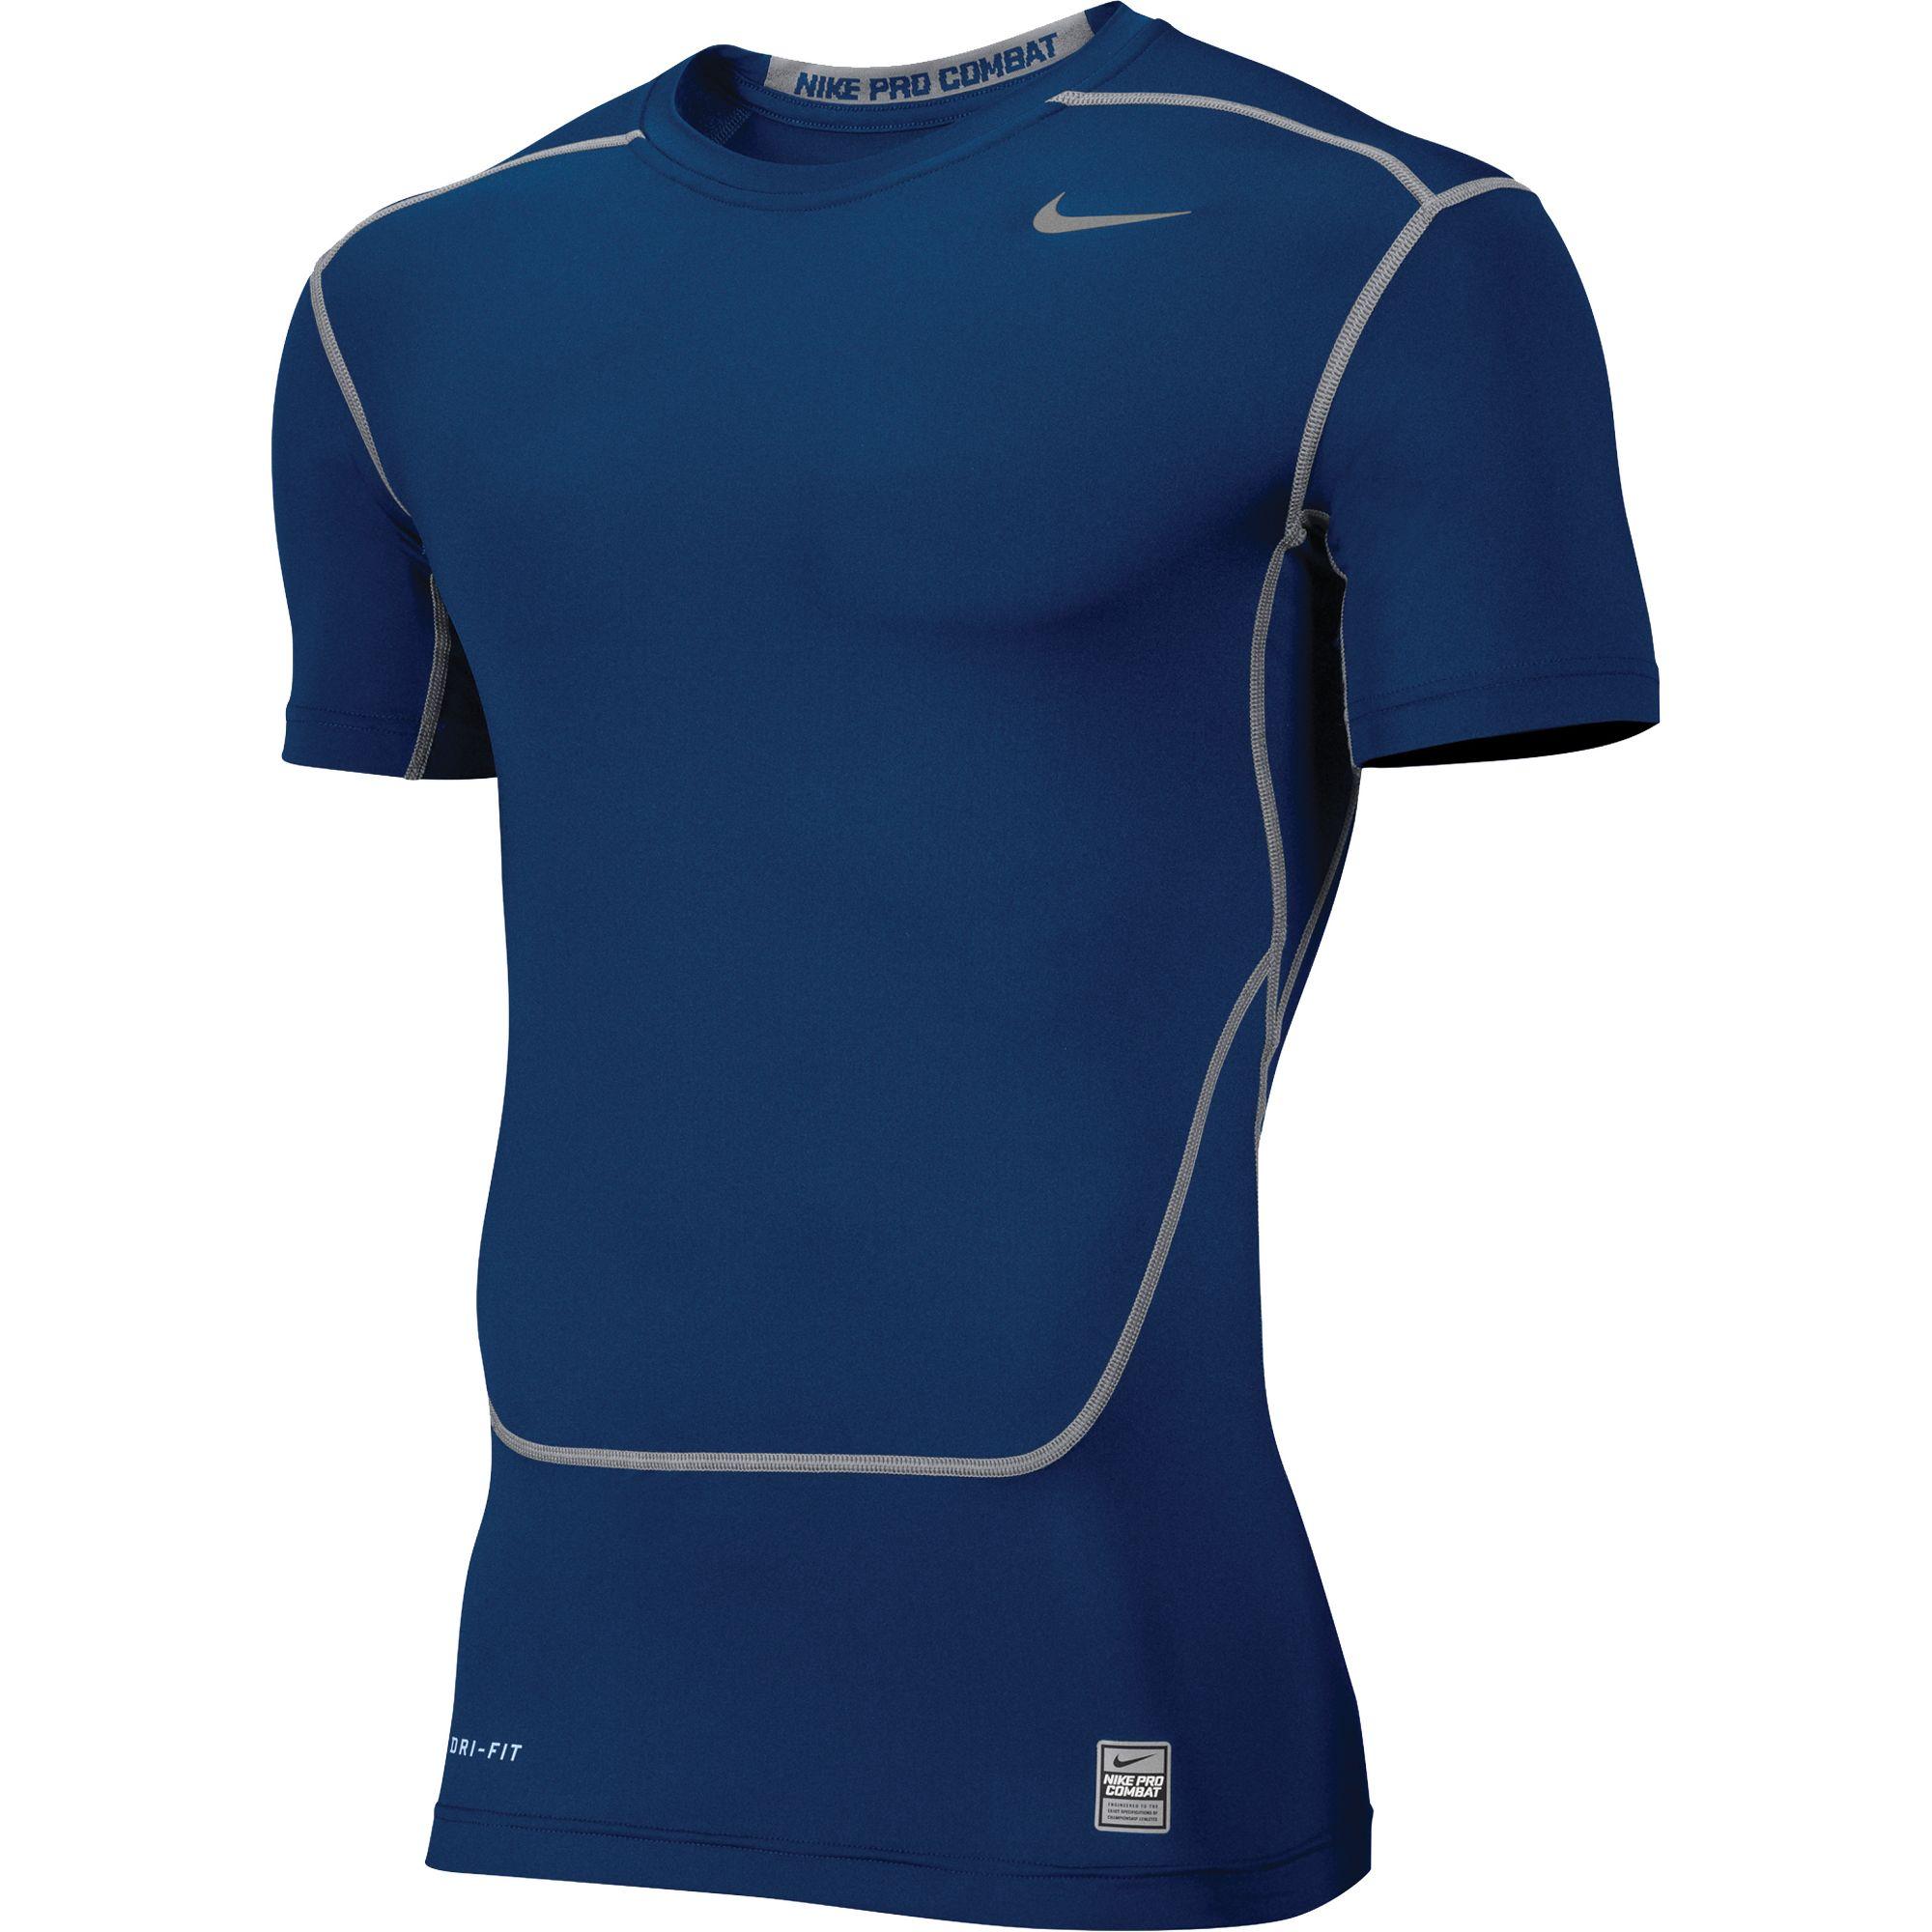 nike men 39 s dri fit pro combat base layer training shirt